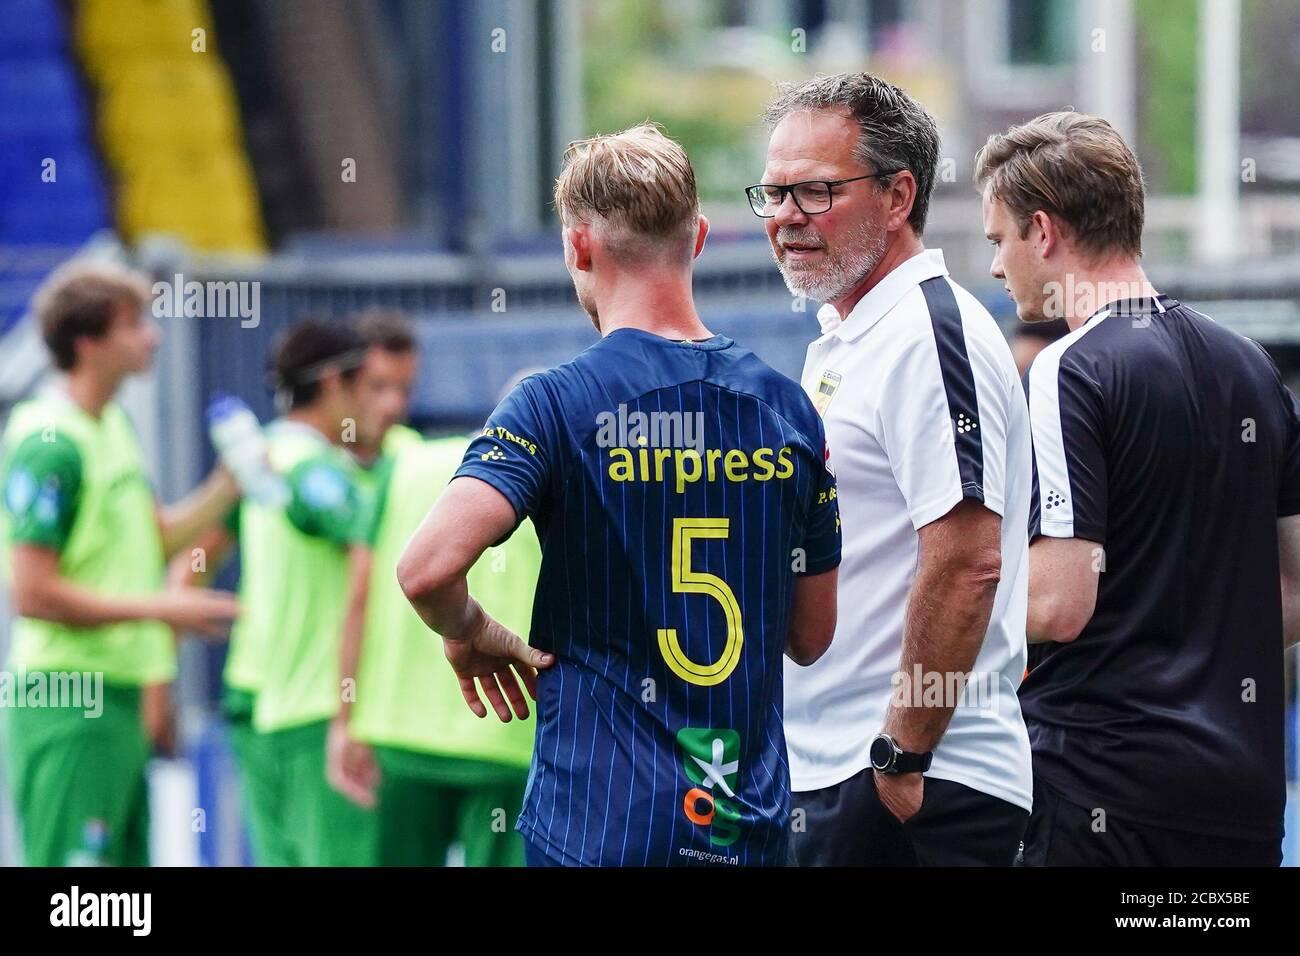 Leeuwarden Netherlands August 1 Henk De Jong Of Sc Cambuur Seen During The Pre Season Match Sc Cambuur V Pec Zwolle On August 1 2020 In Leeuward Stock Photo Alamy